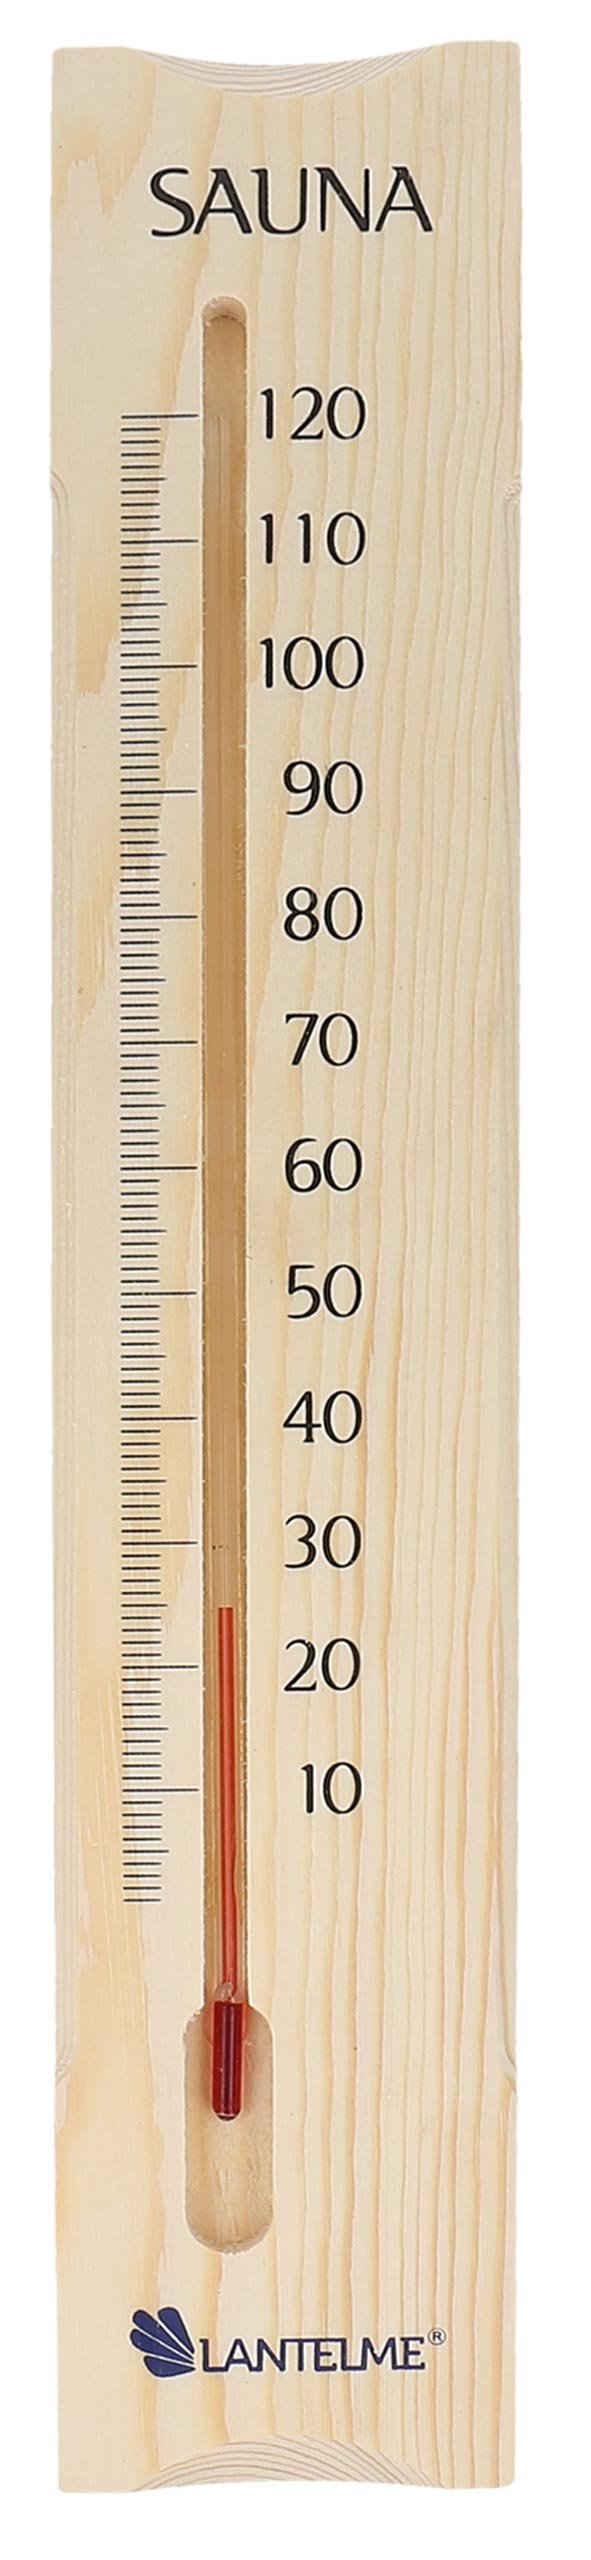 Lantelme Badethermometer »Saunathermometer«, 38cm, Kiefernholz